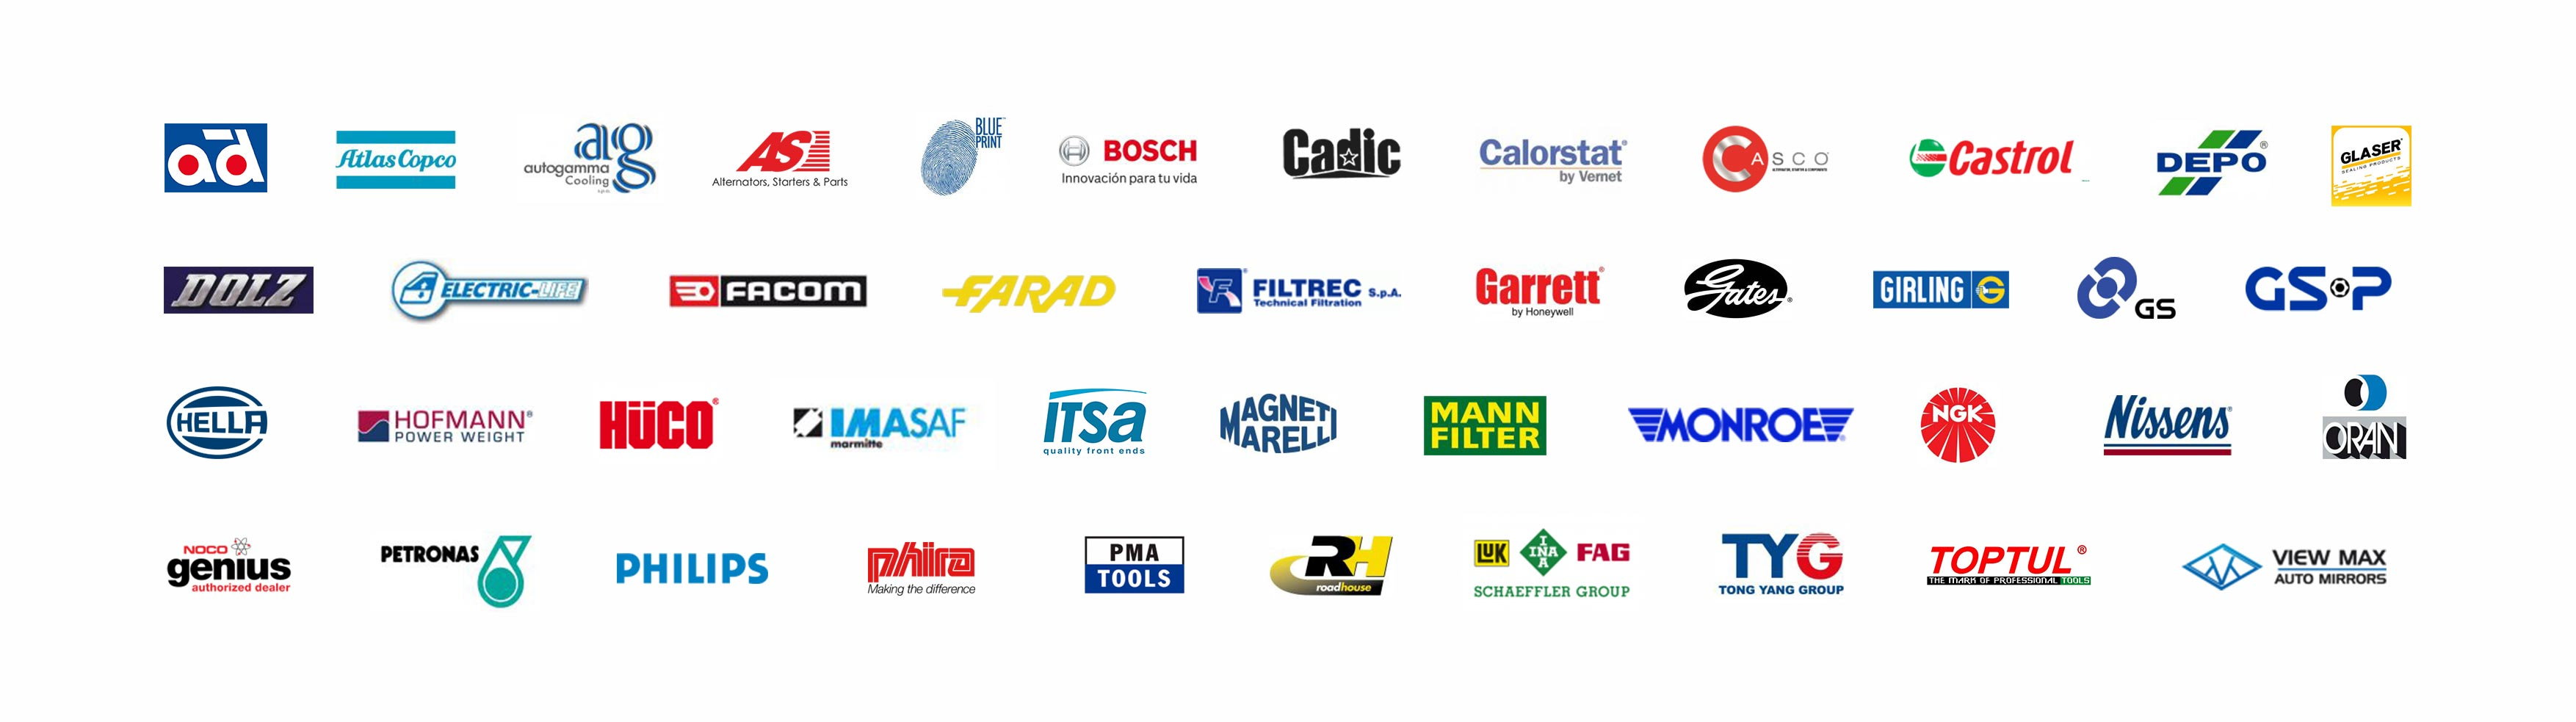 Logos-Auteide-web3